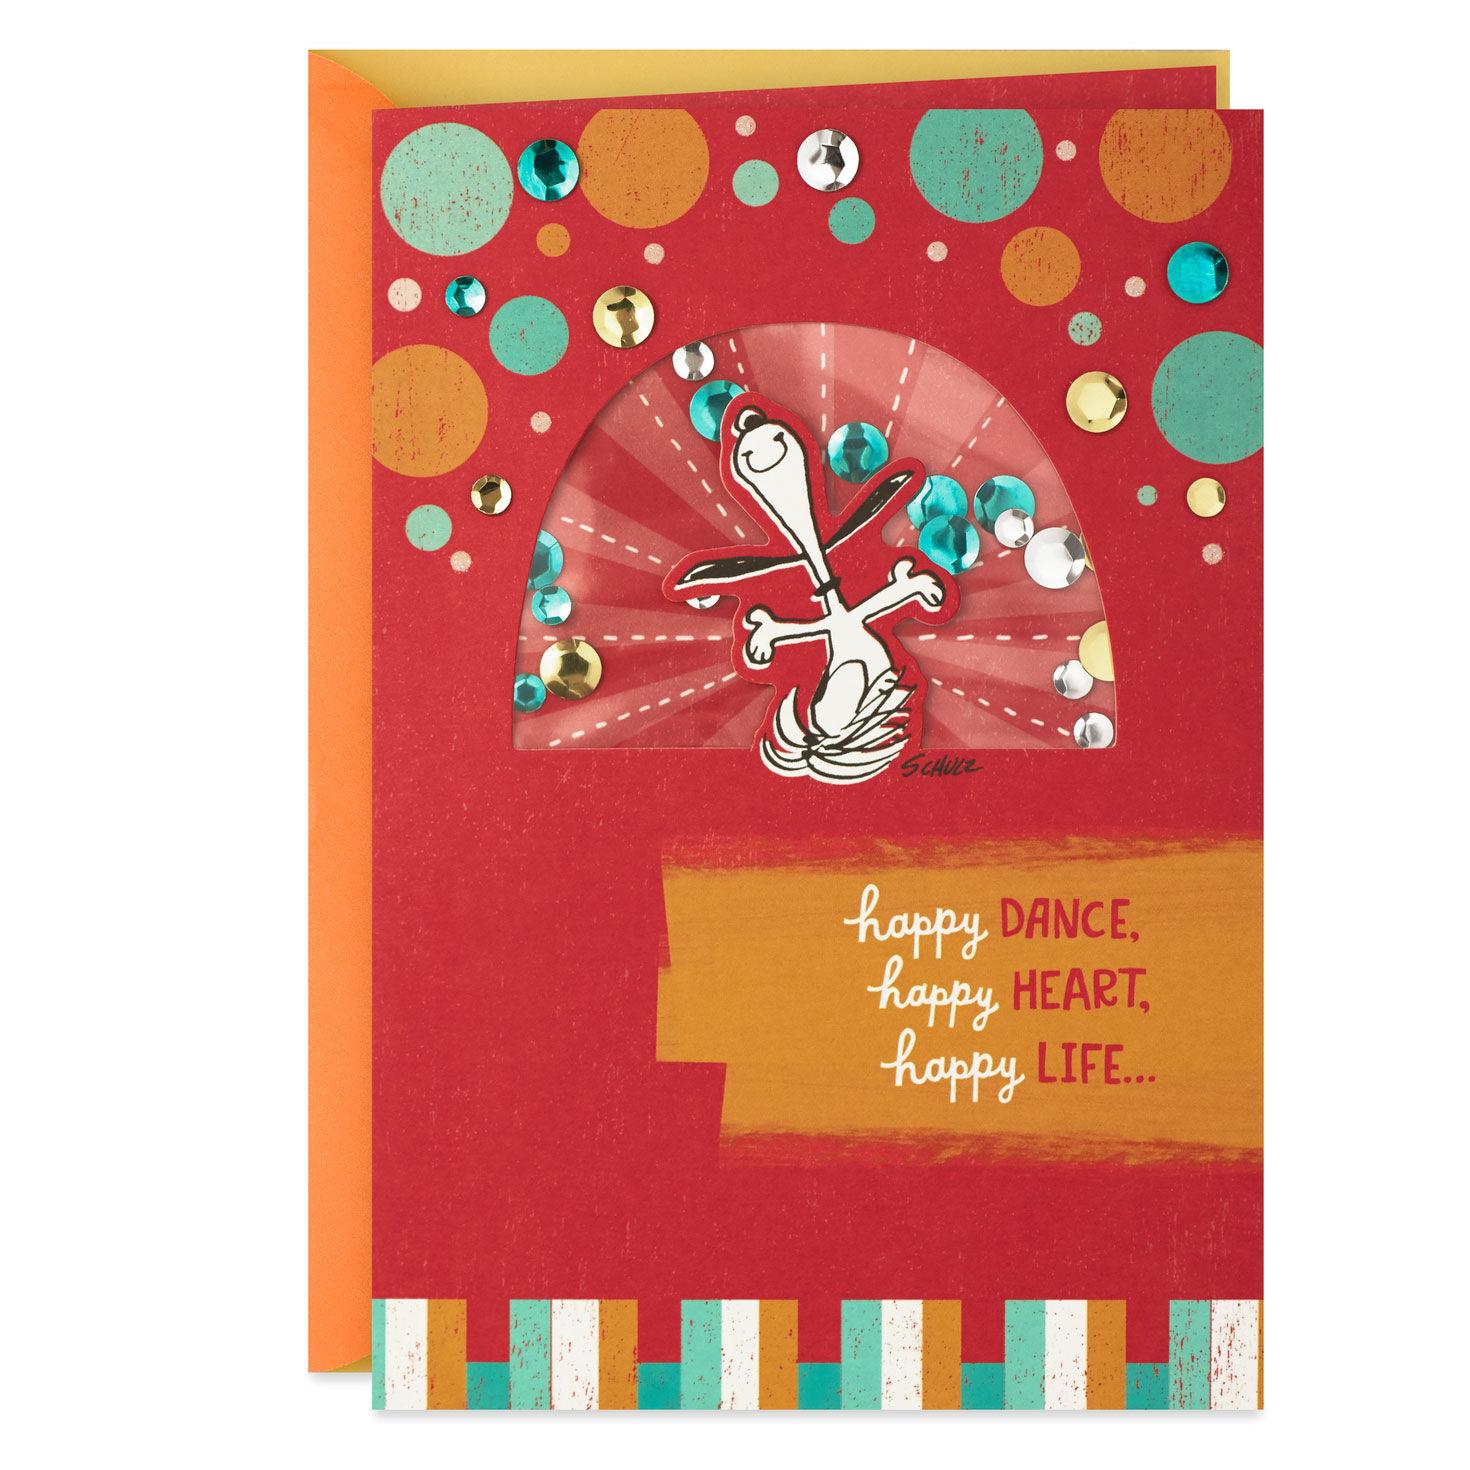 Snoopy Happy Dance Birthday Card - Greeting Cards - Hallmark